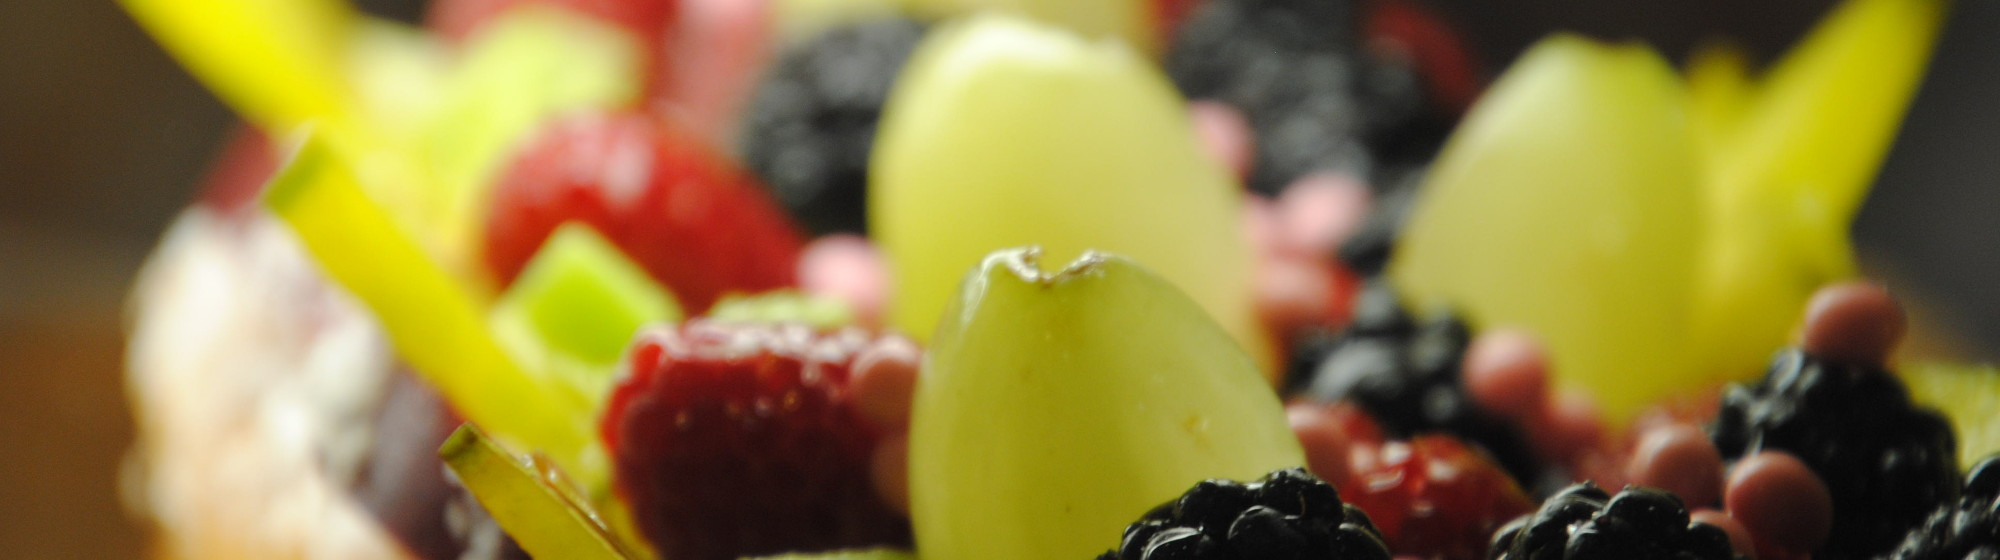 pasticceria-fresca-venaria